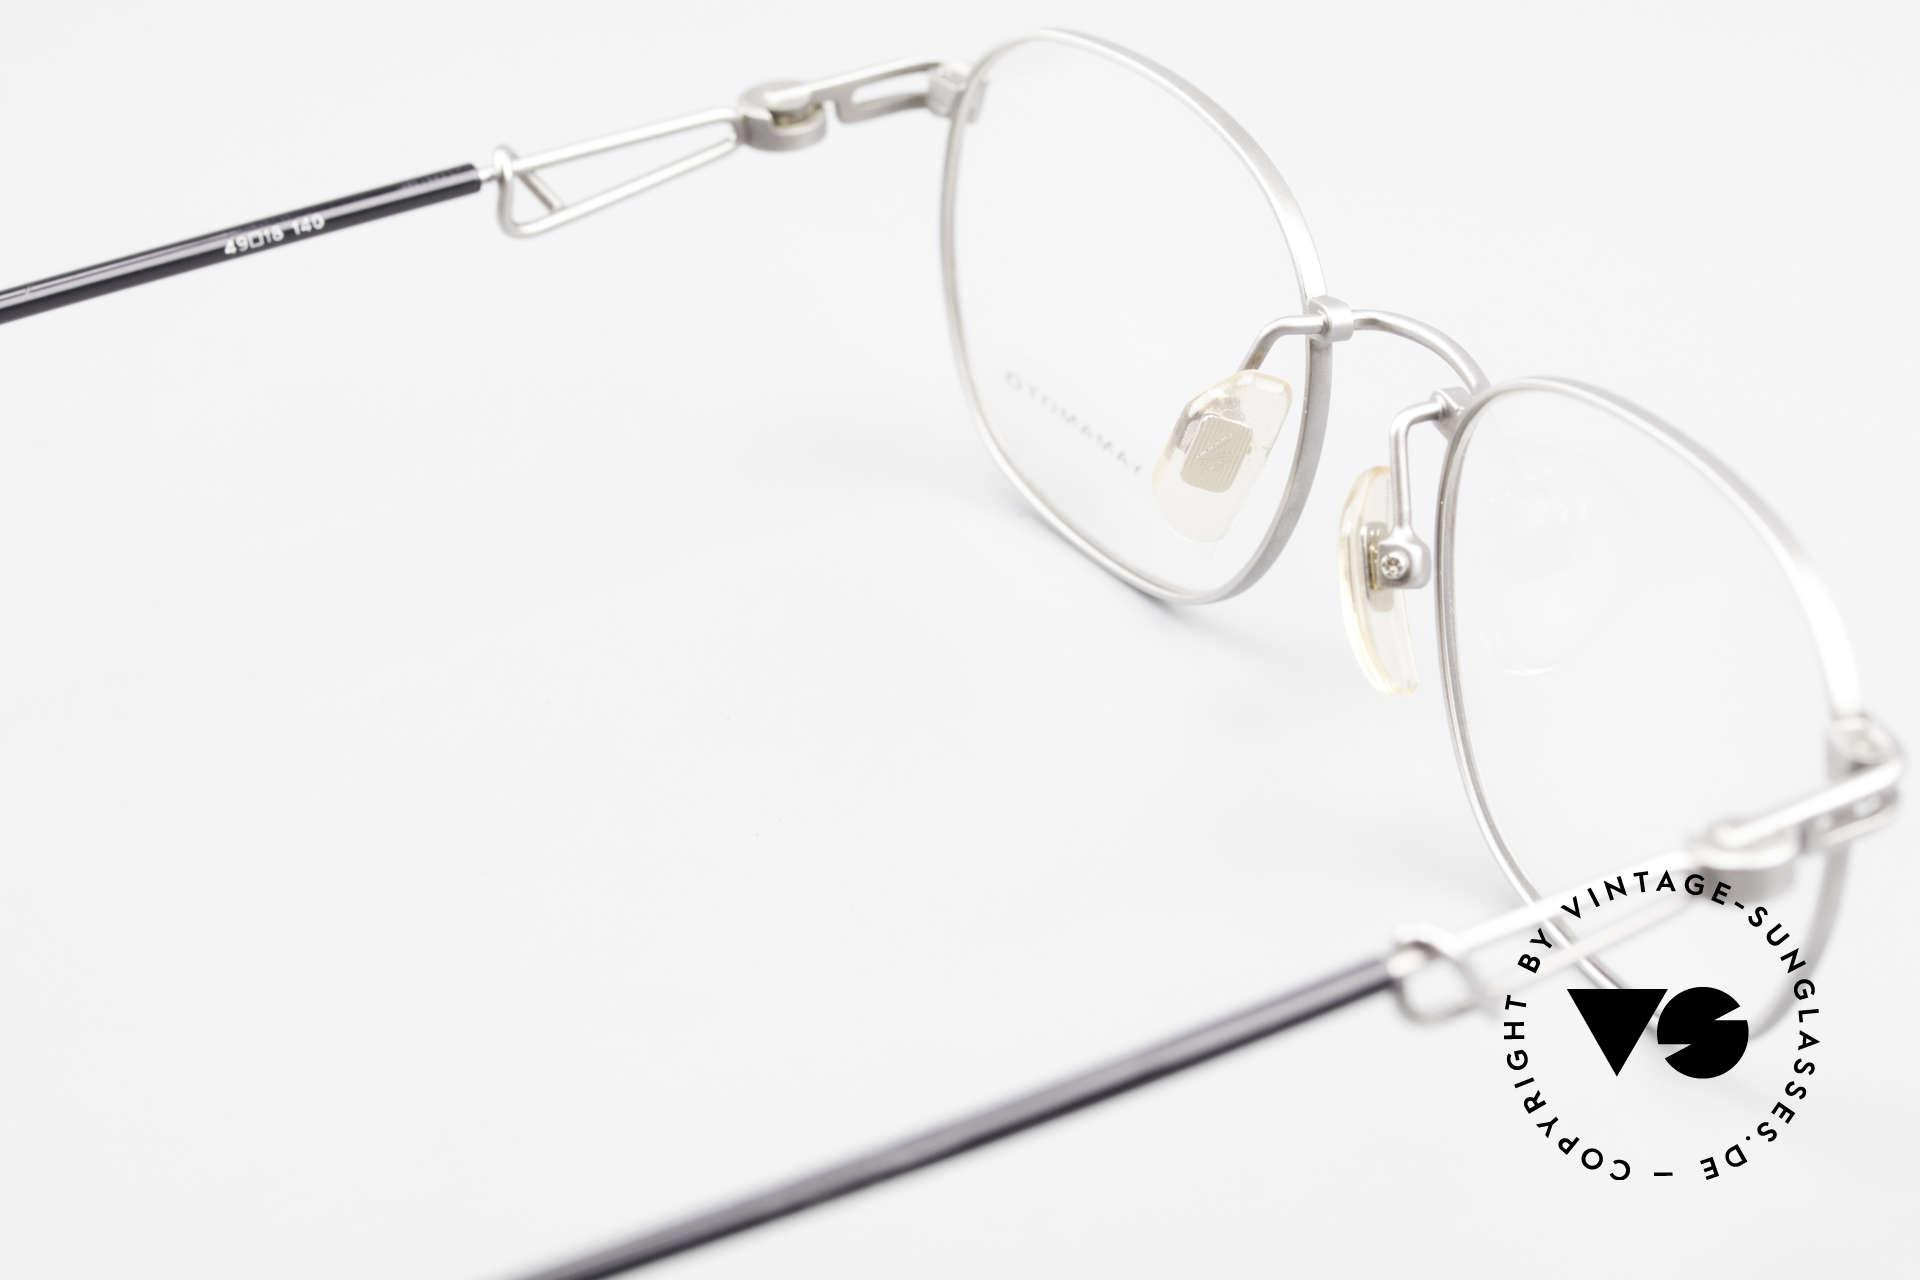 Yohji Yamamoto 51-4113 Titanium Designer Eyeglasses, Size: small, Made for Men and Women